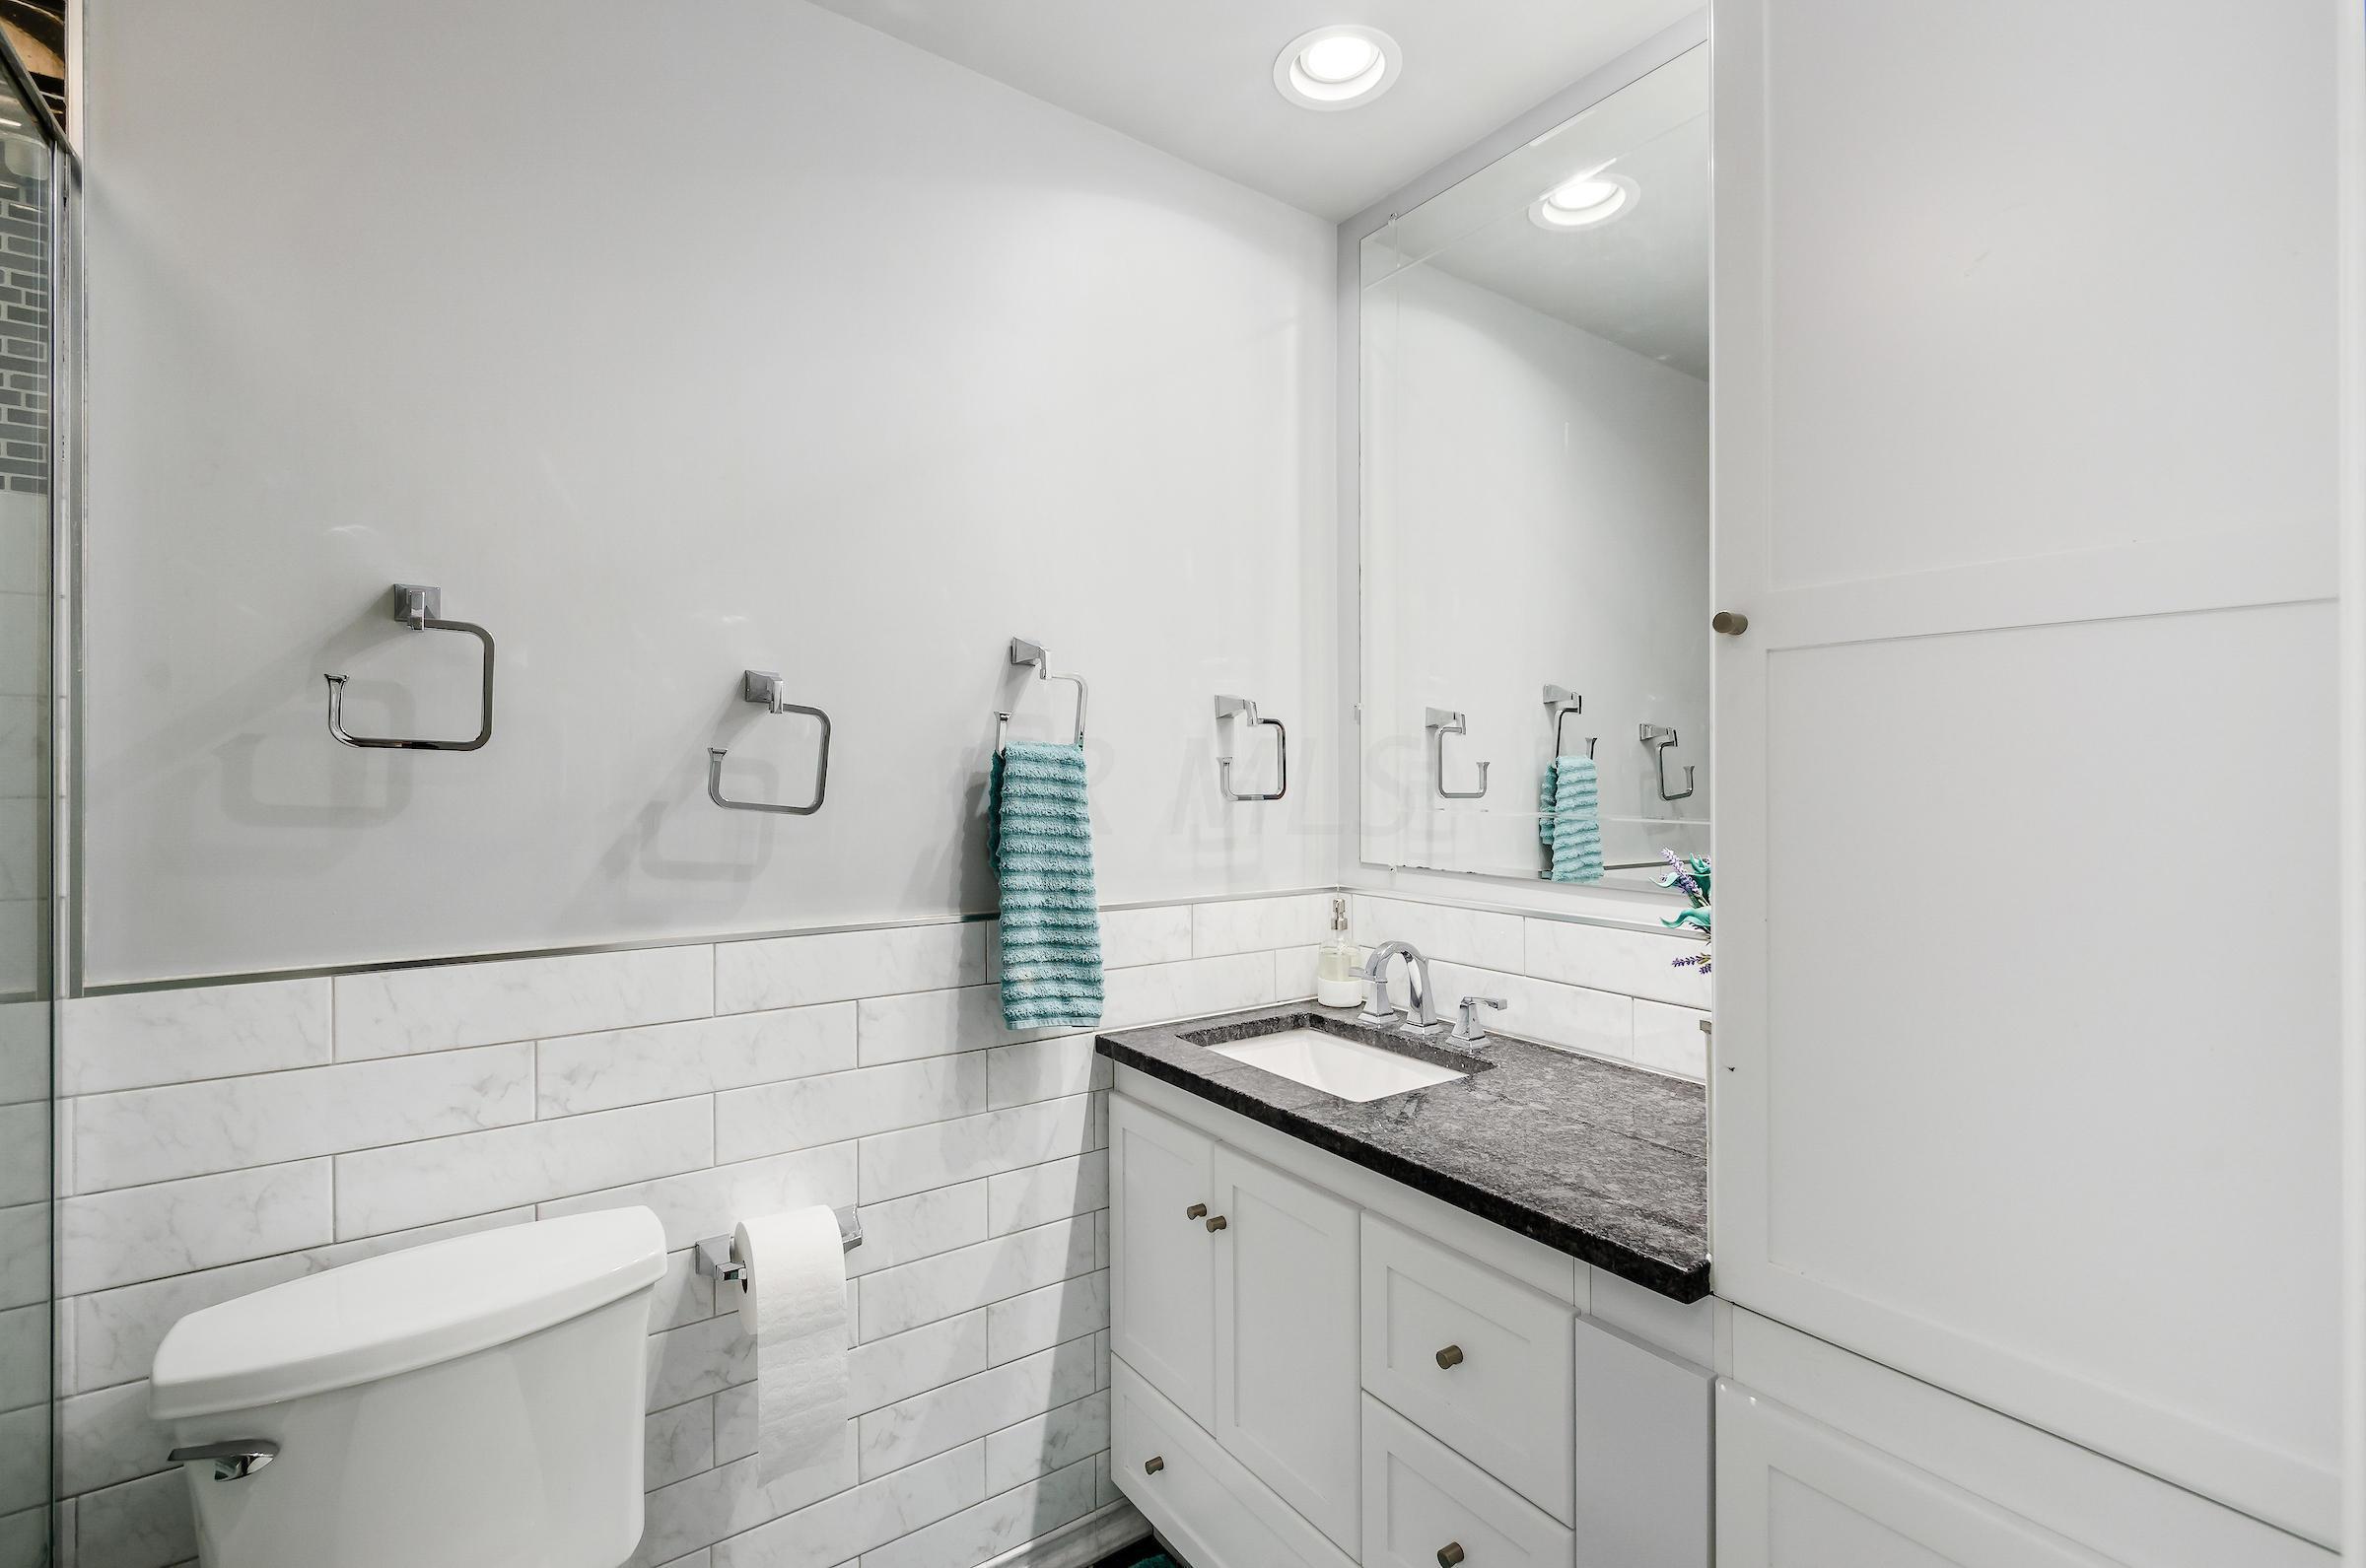 2088 Haviland Road, Columbus, Ohio 43220, 3 Bedrooms Bedrooms, ,2 BathroomsBathrooms,Residential,For Sale,Haviland,220018642